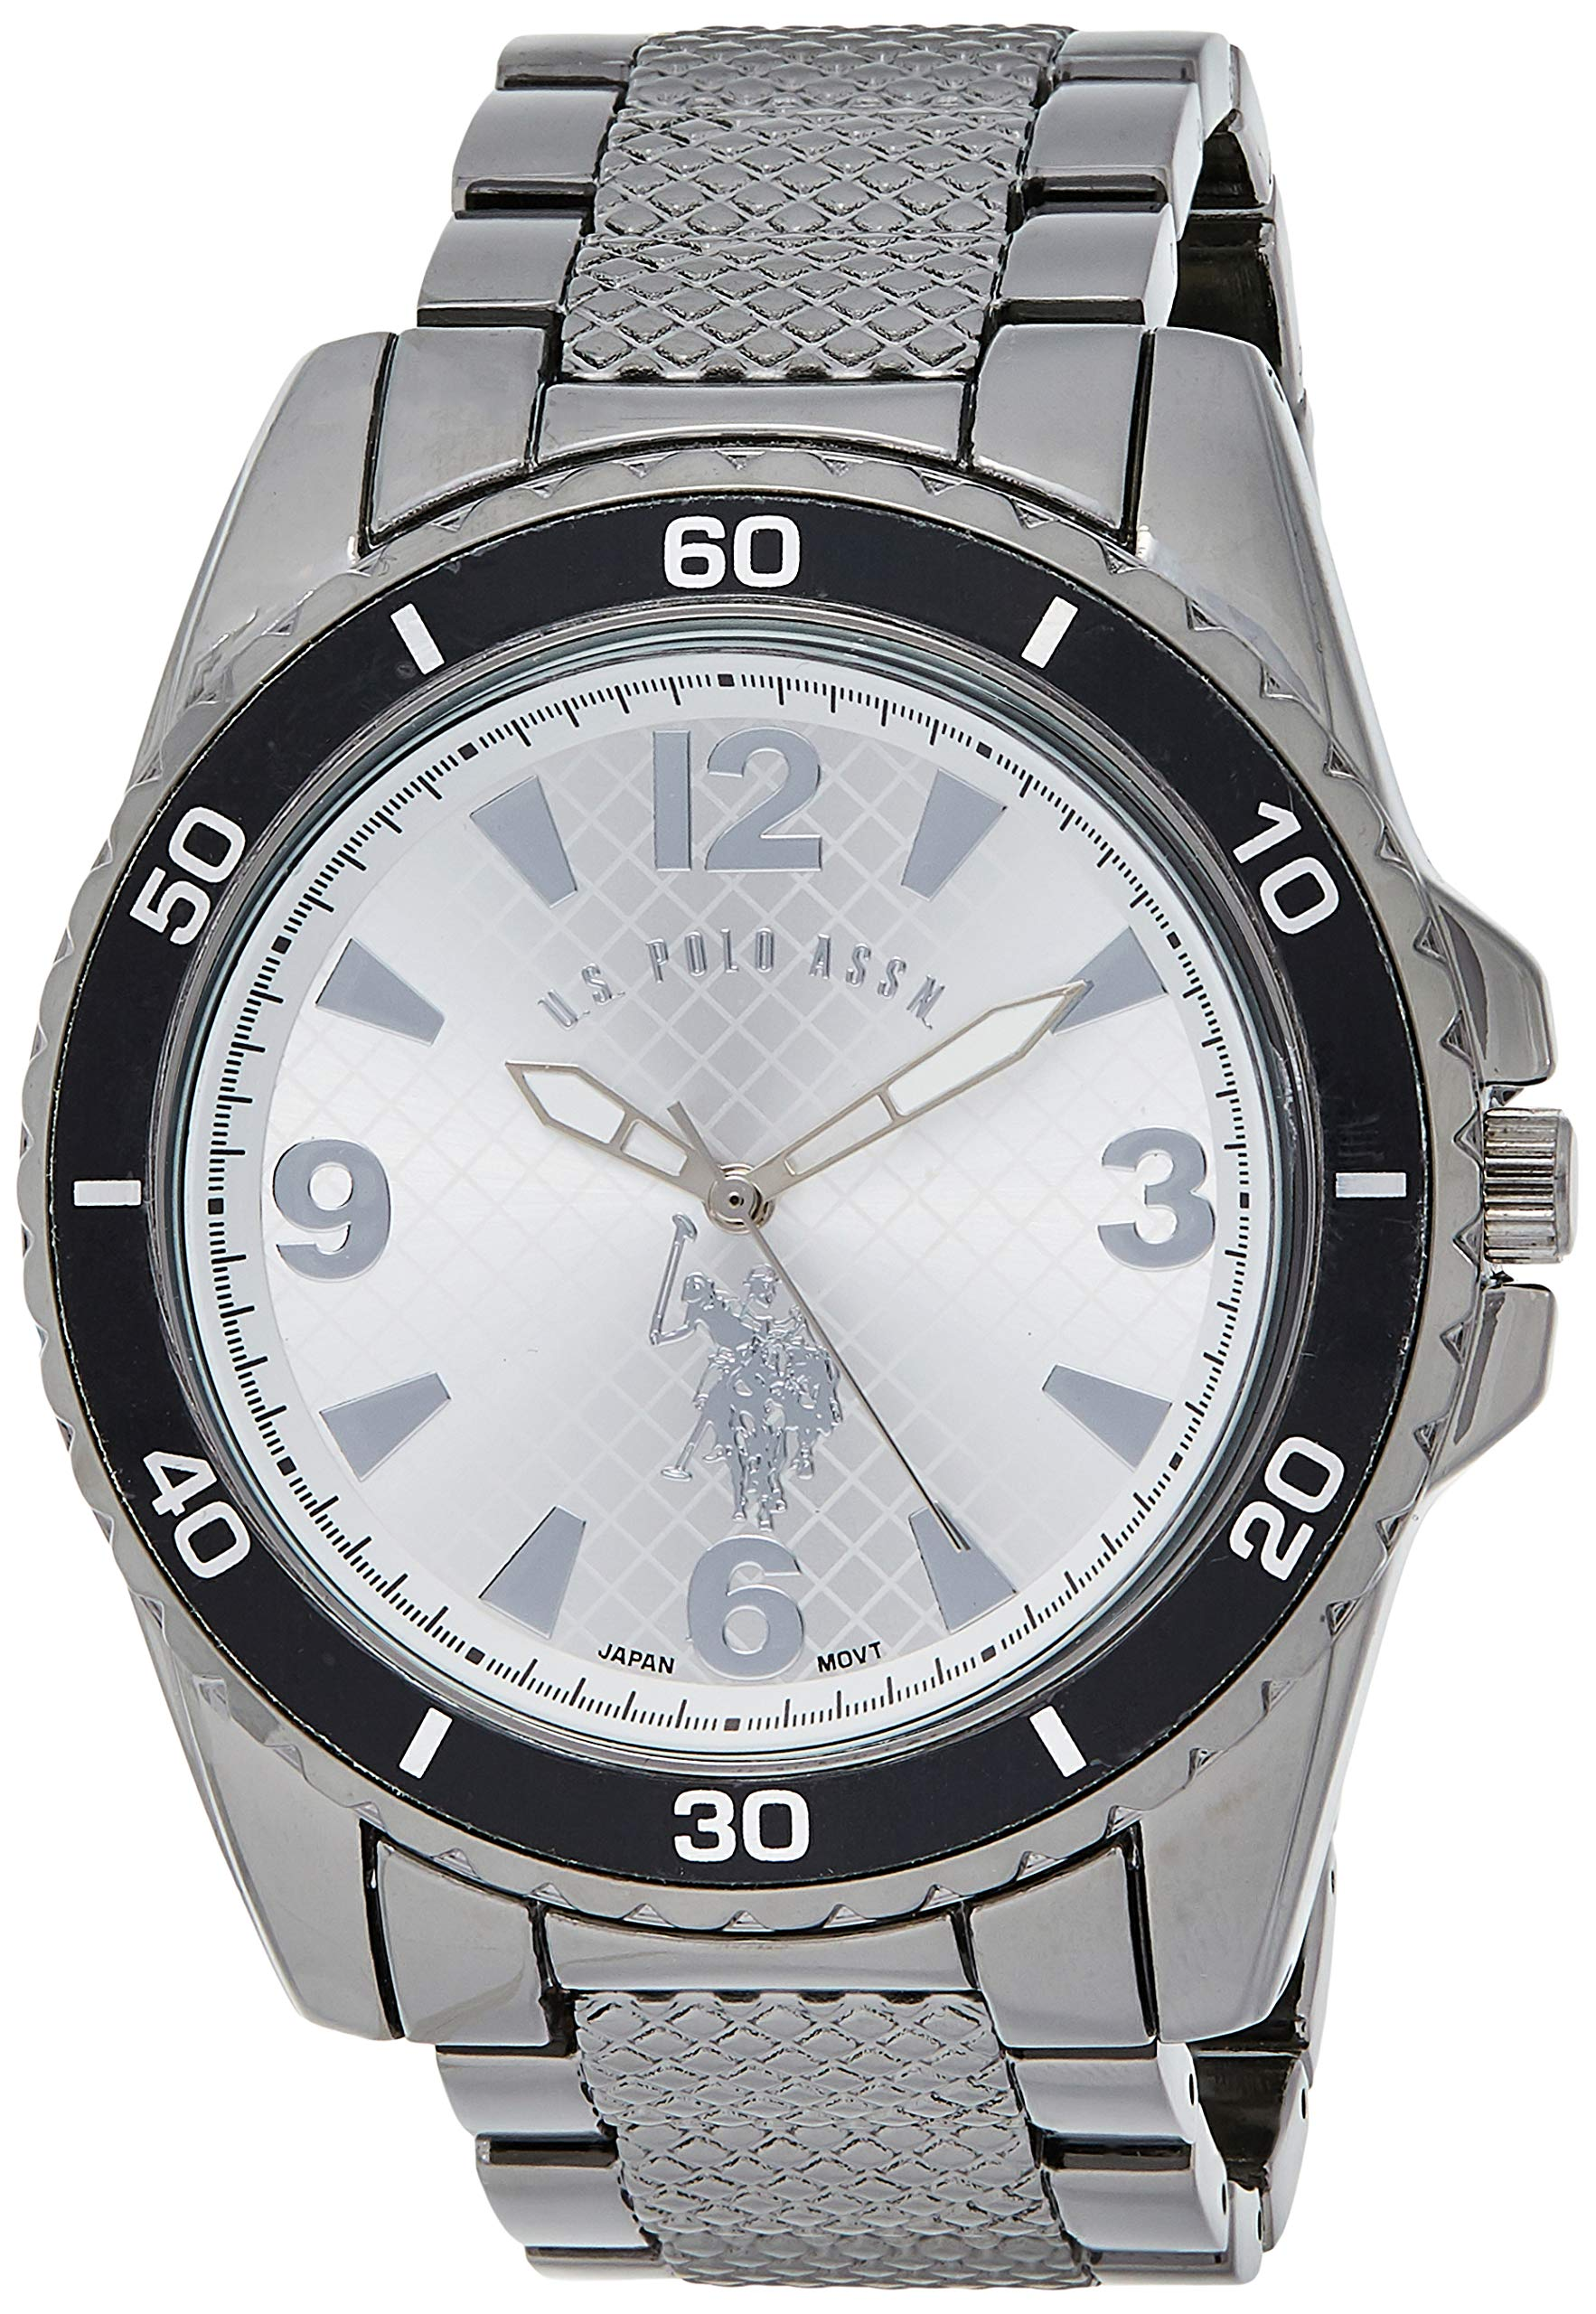 U.S. Polo Assn. Classic Men's USC80257 Analog Display Analog Quartz Two Tone Watch